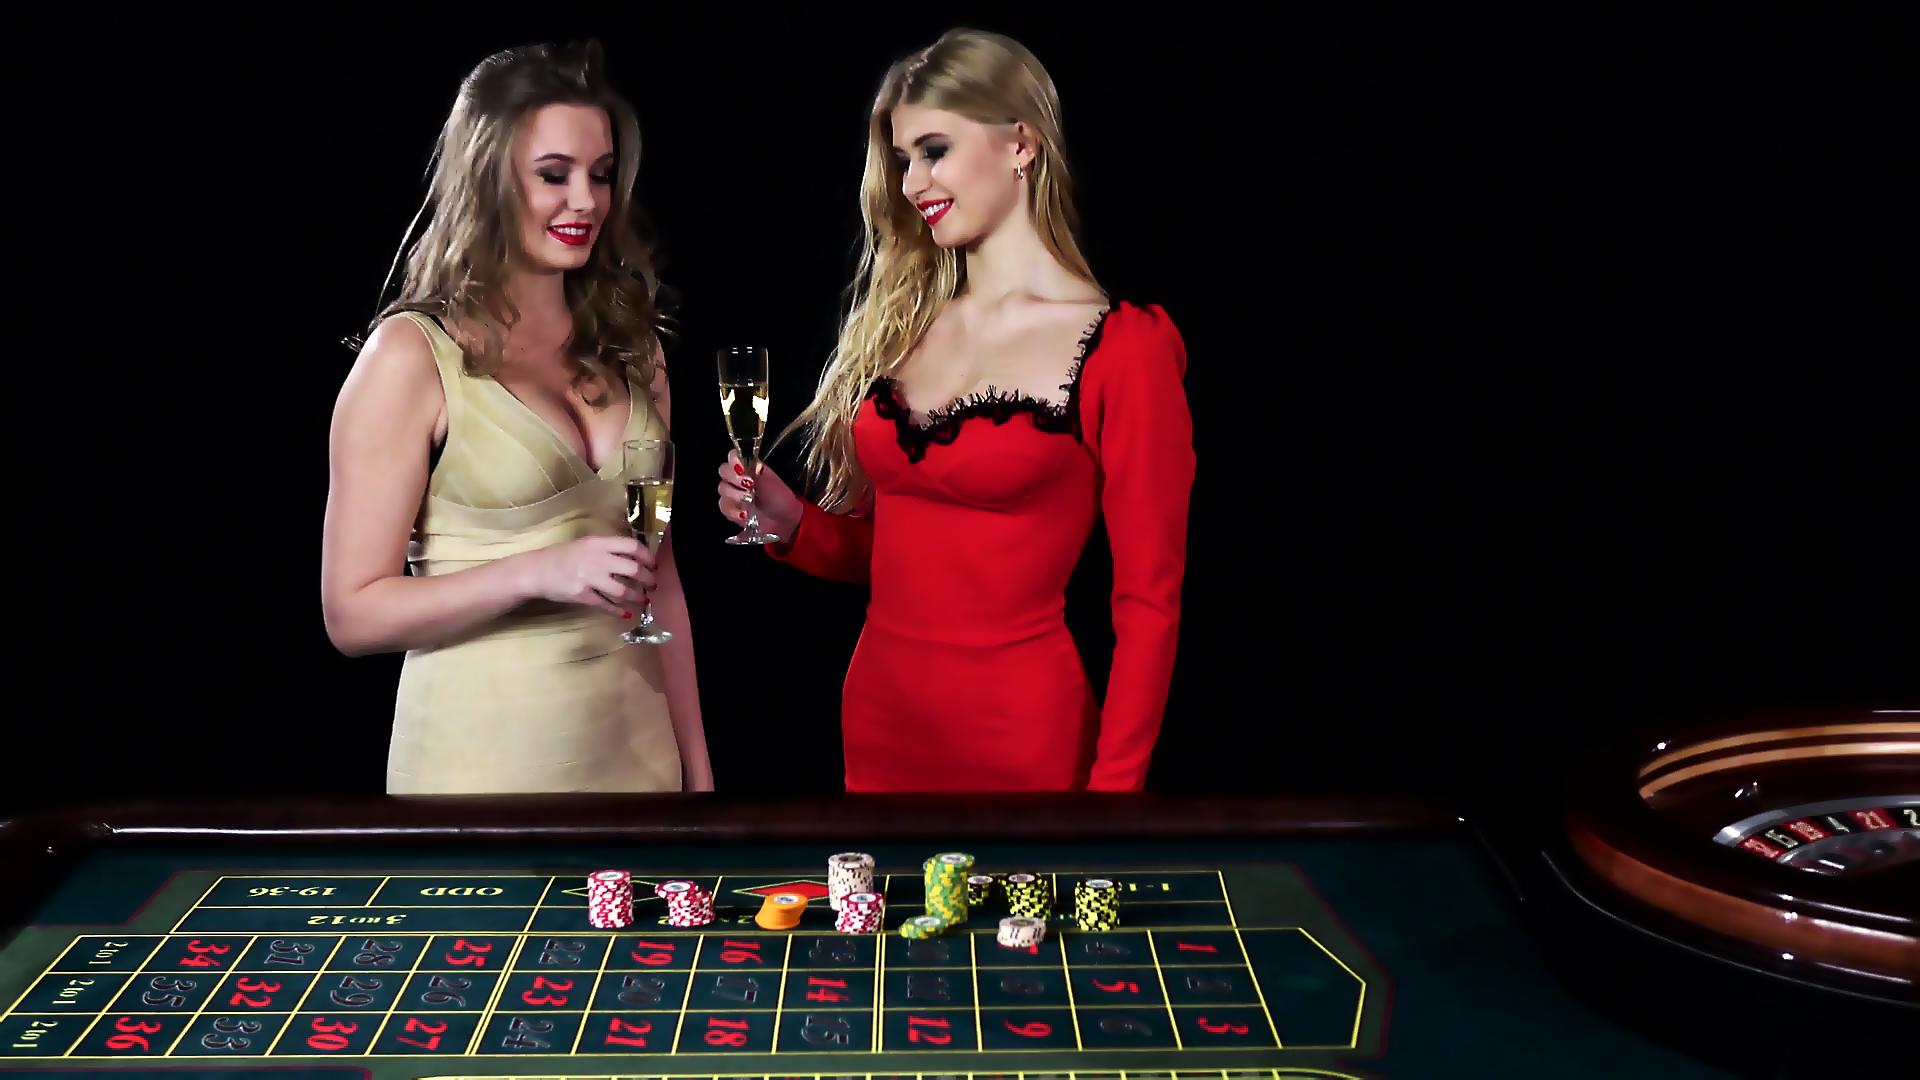 Online casino free bets